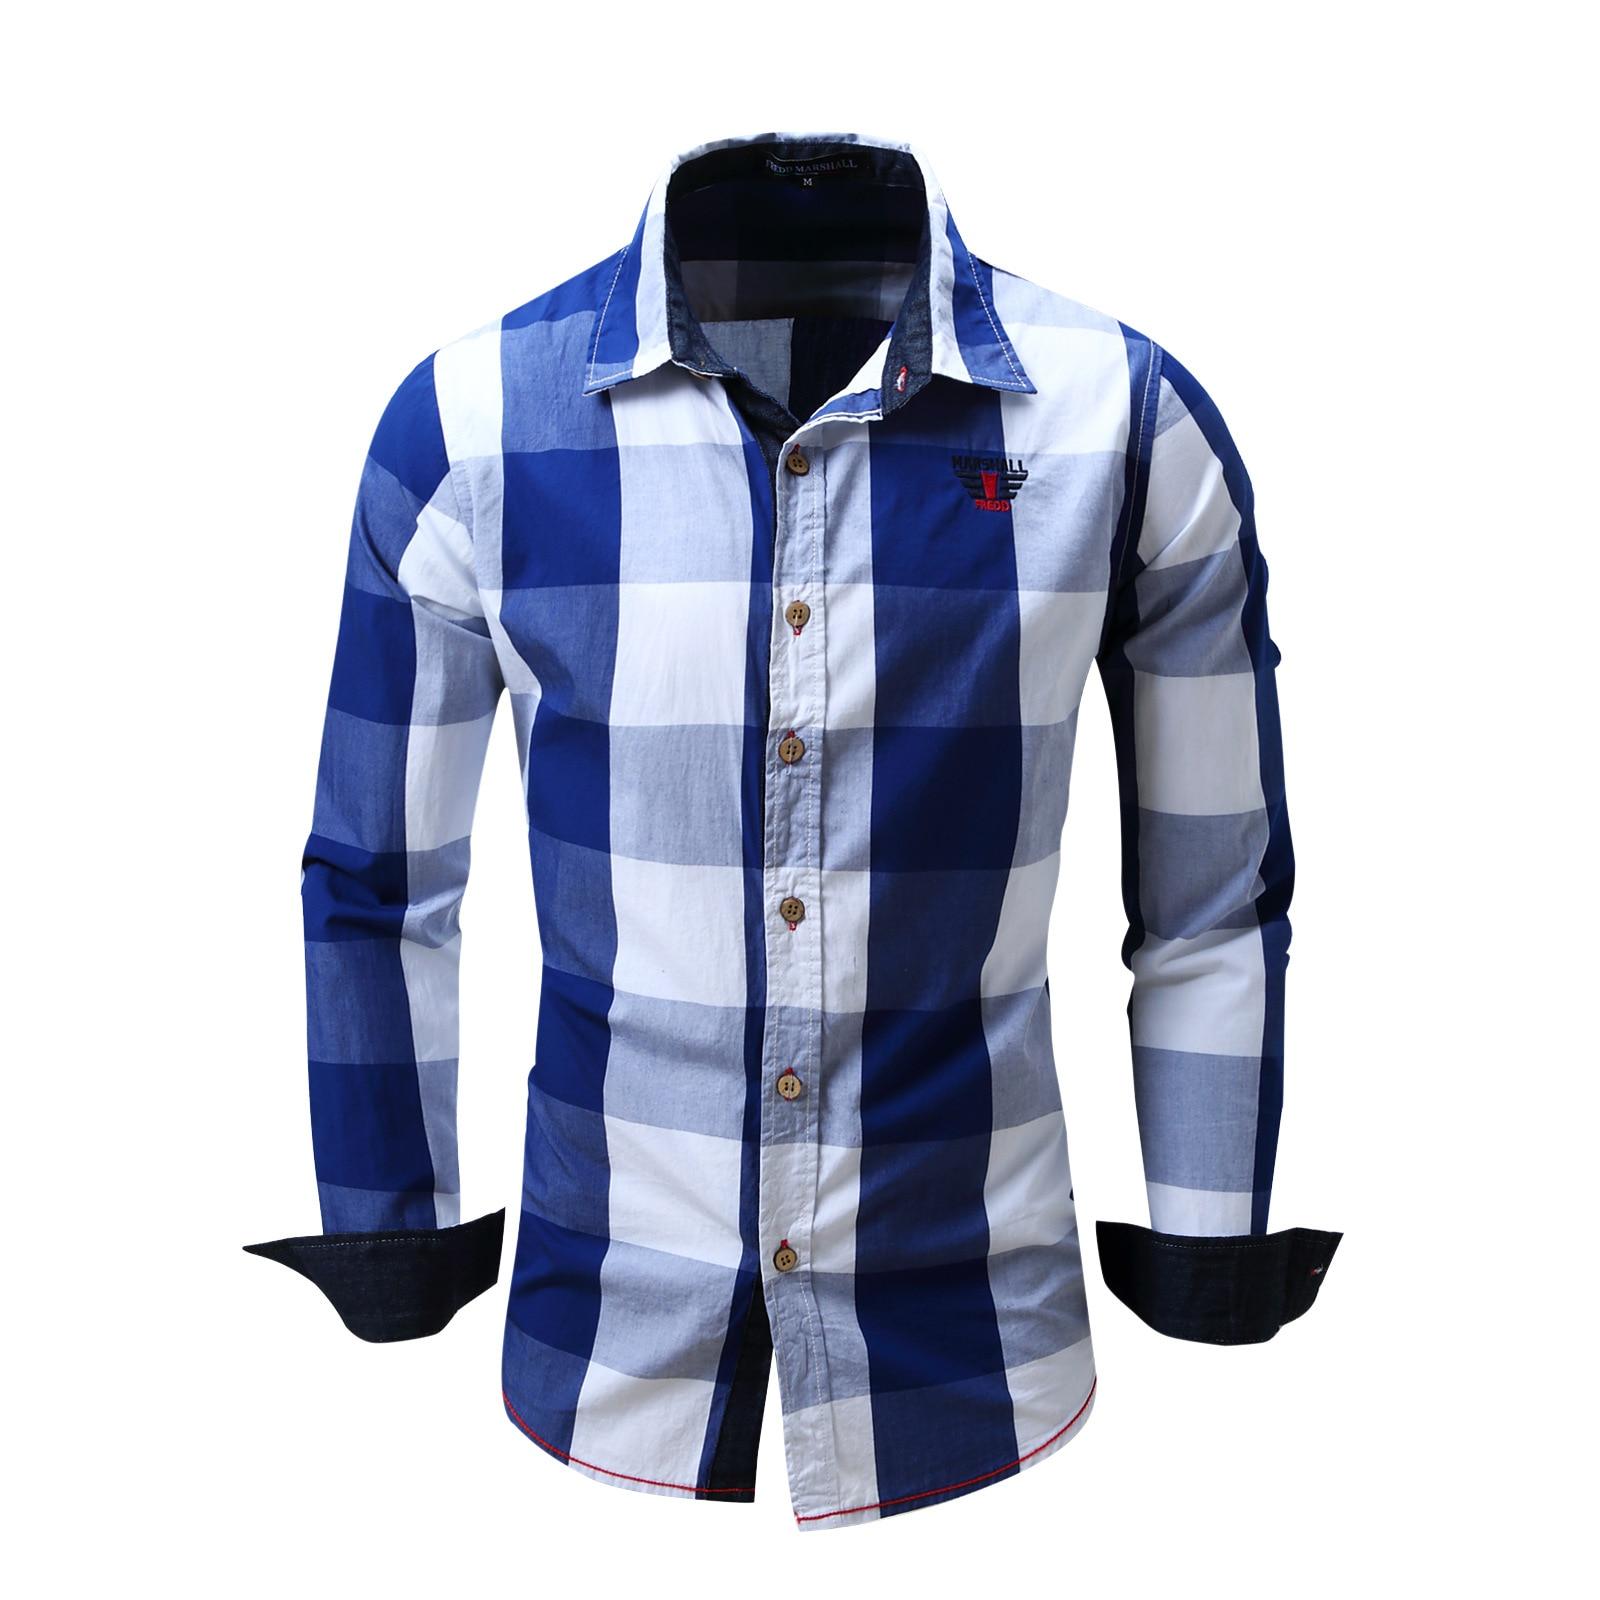 2017 New Arrival Mens shirt Long Sleeve Shirt Mens Dress Shirts Brand Casual Fashion Business Style Shirts Cotton